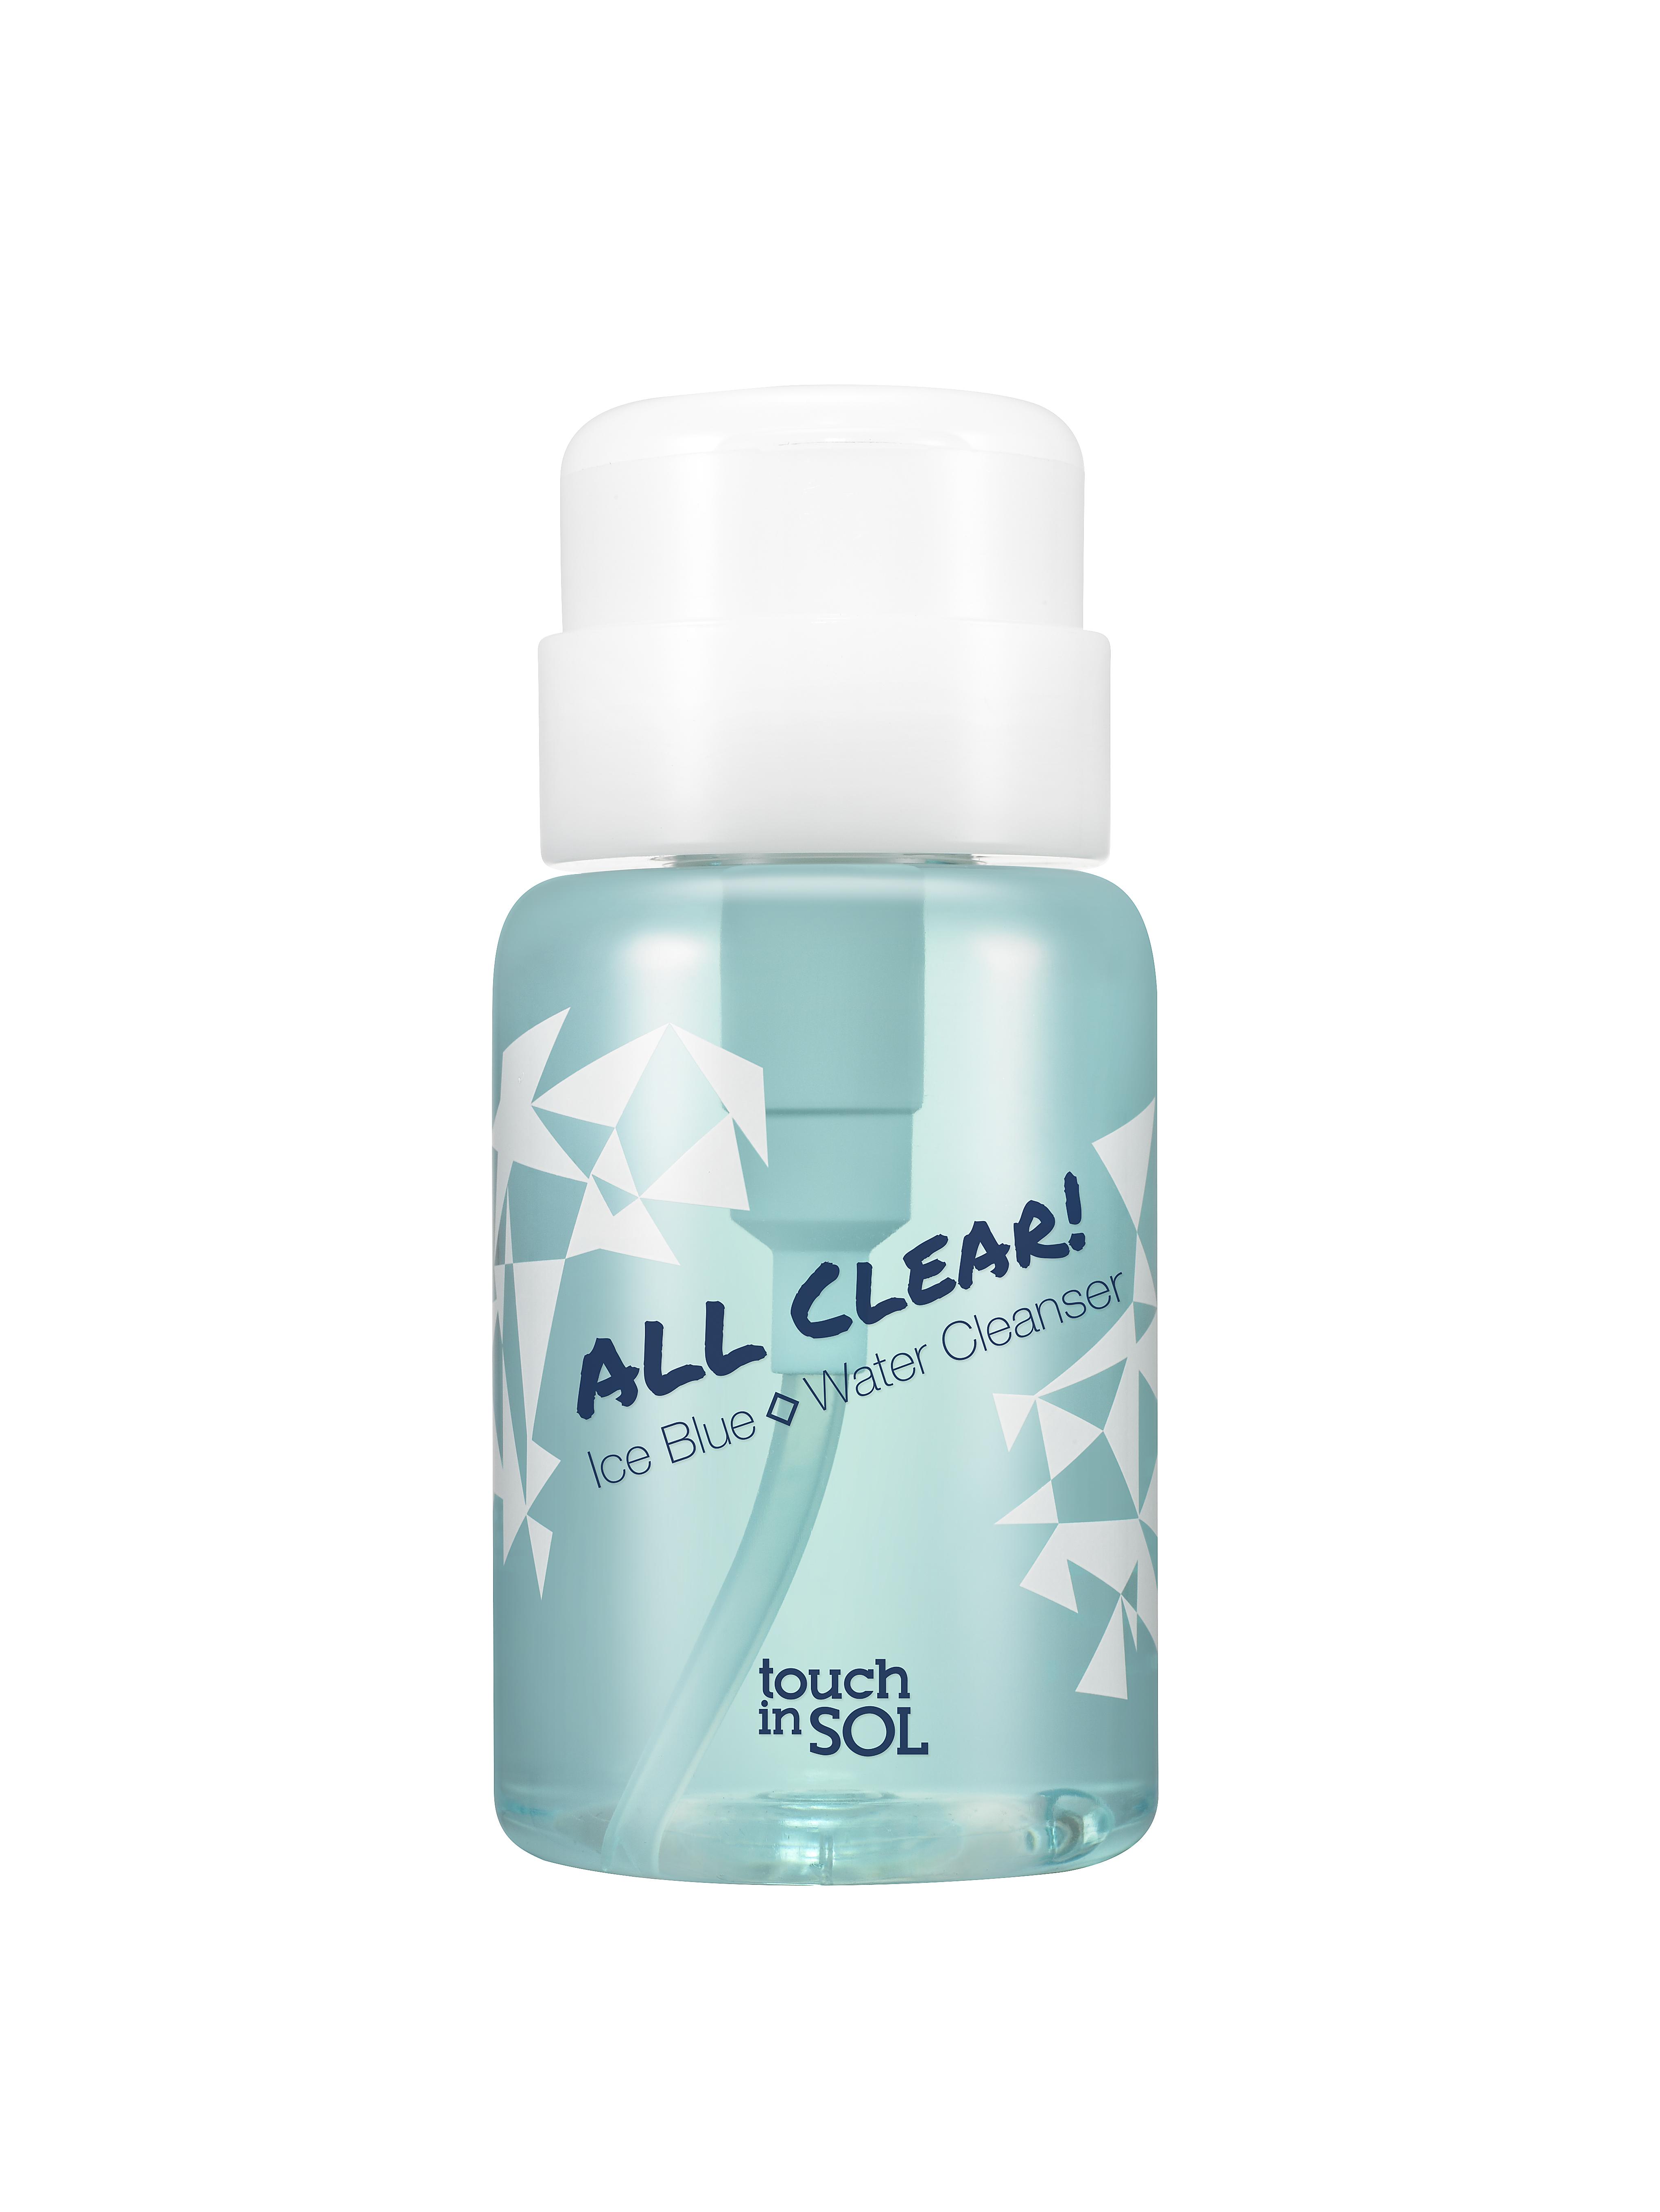 Touch in SOL Средство для снятия макияжа All Clear! Ice Blue Water, 150 мл mexx ice touch woman